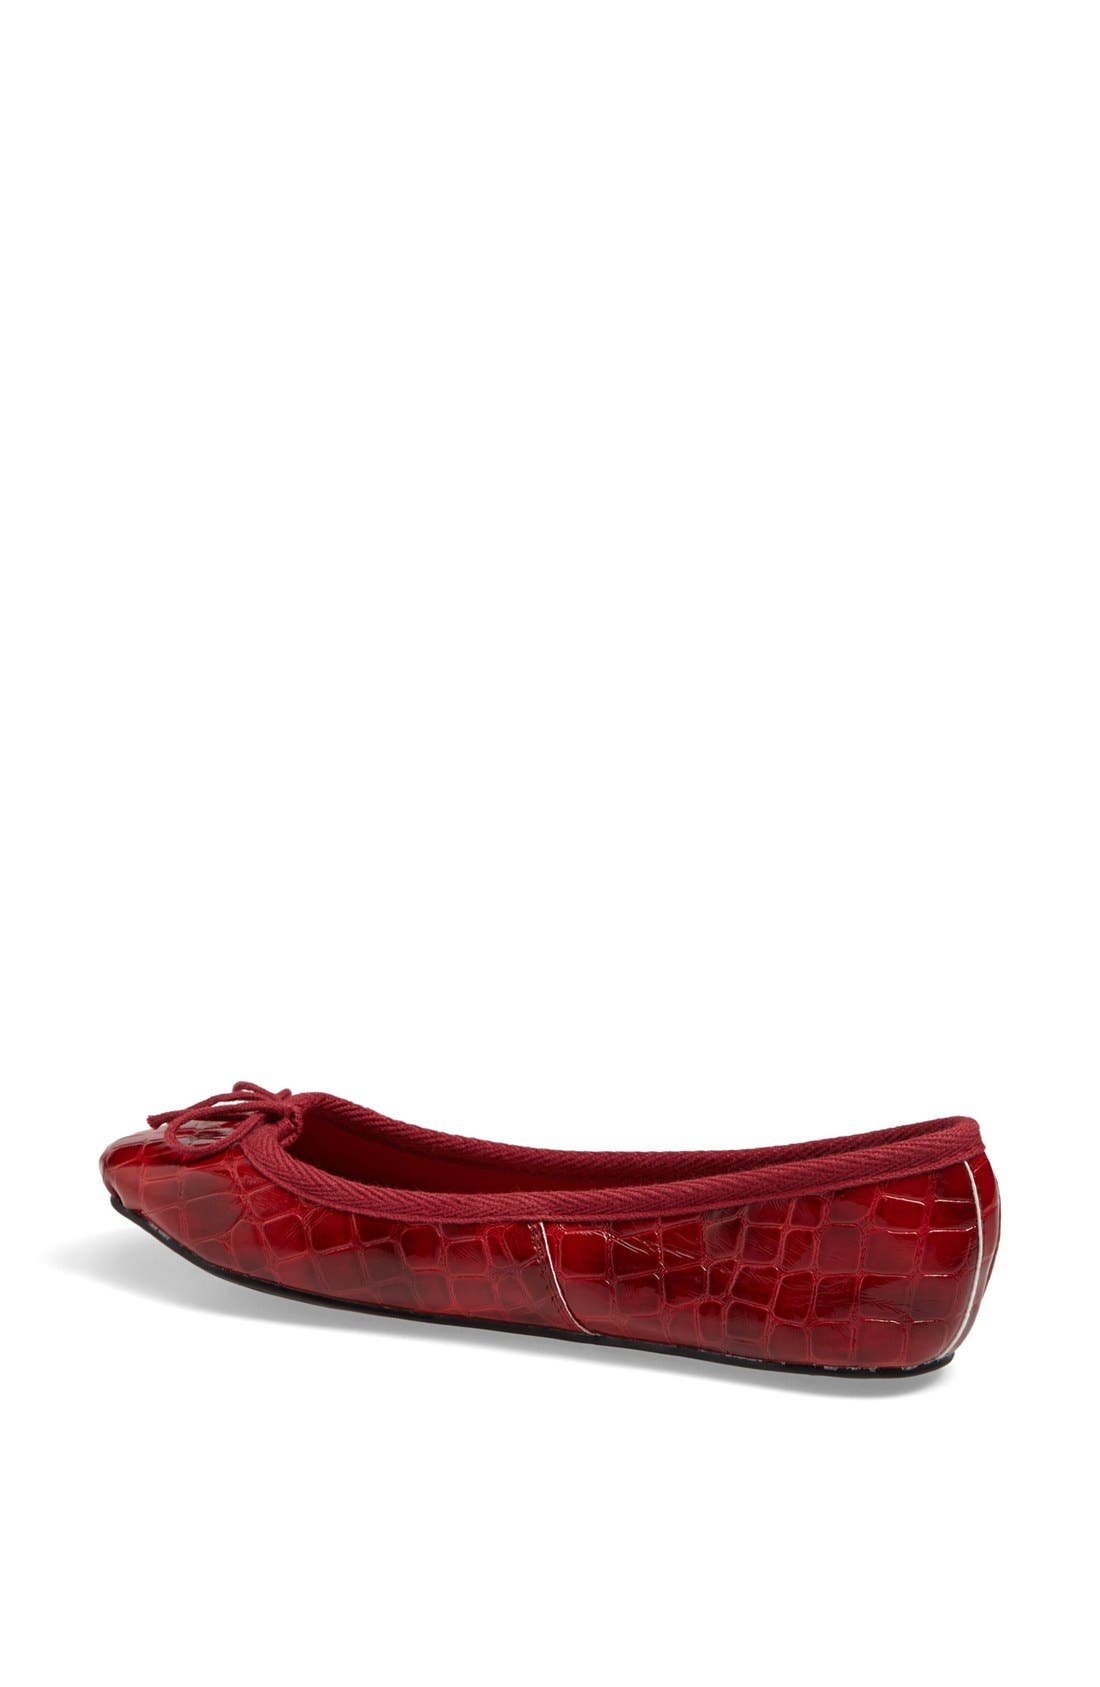 Alternate Image 2  - Topshop 'Vibrant' Croc Embossed Ballerina Flat